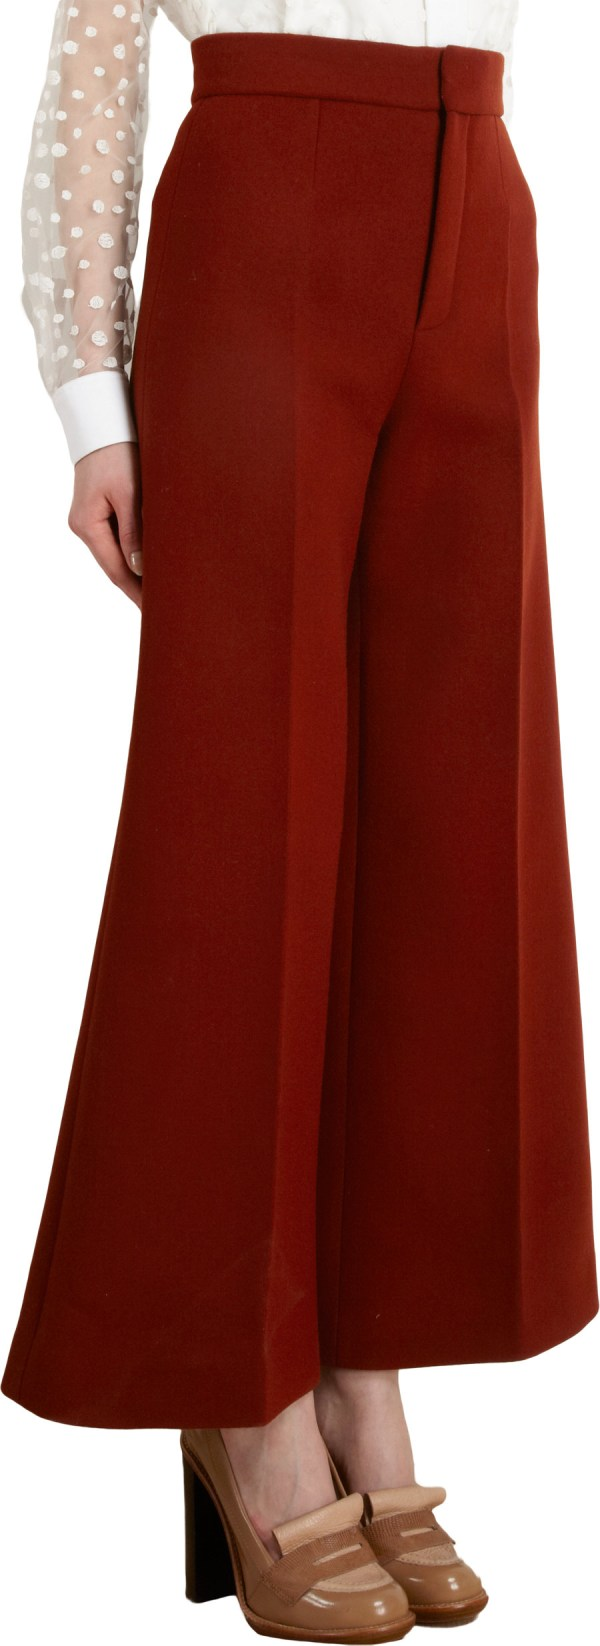 Chlo Wide Leg Gaucho Pants In Red - Lyst